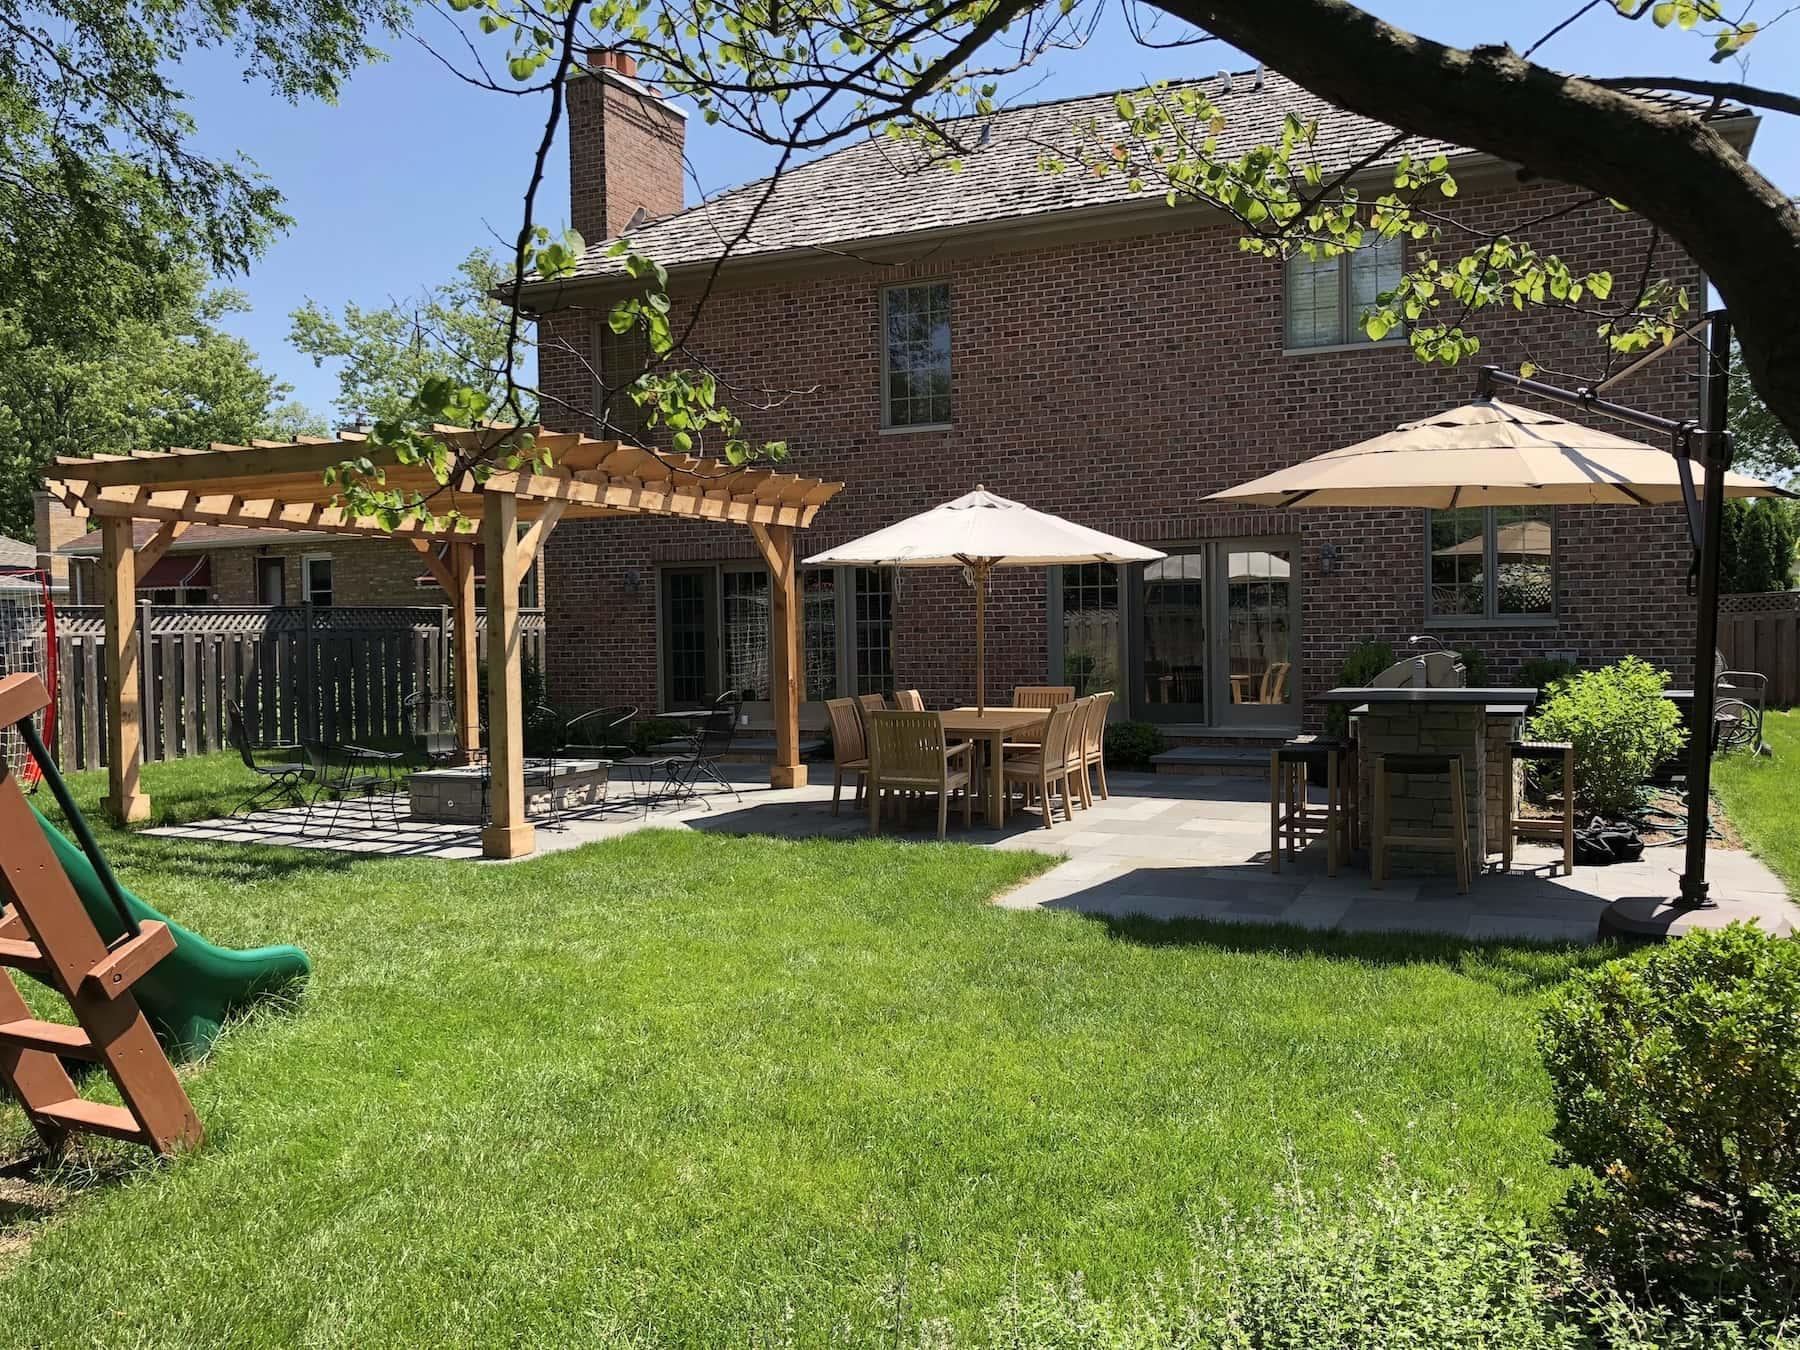 Pergola Paver Patio Outdoor Kitchen Pub Seating Glenview, IL